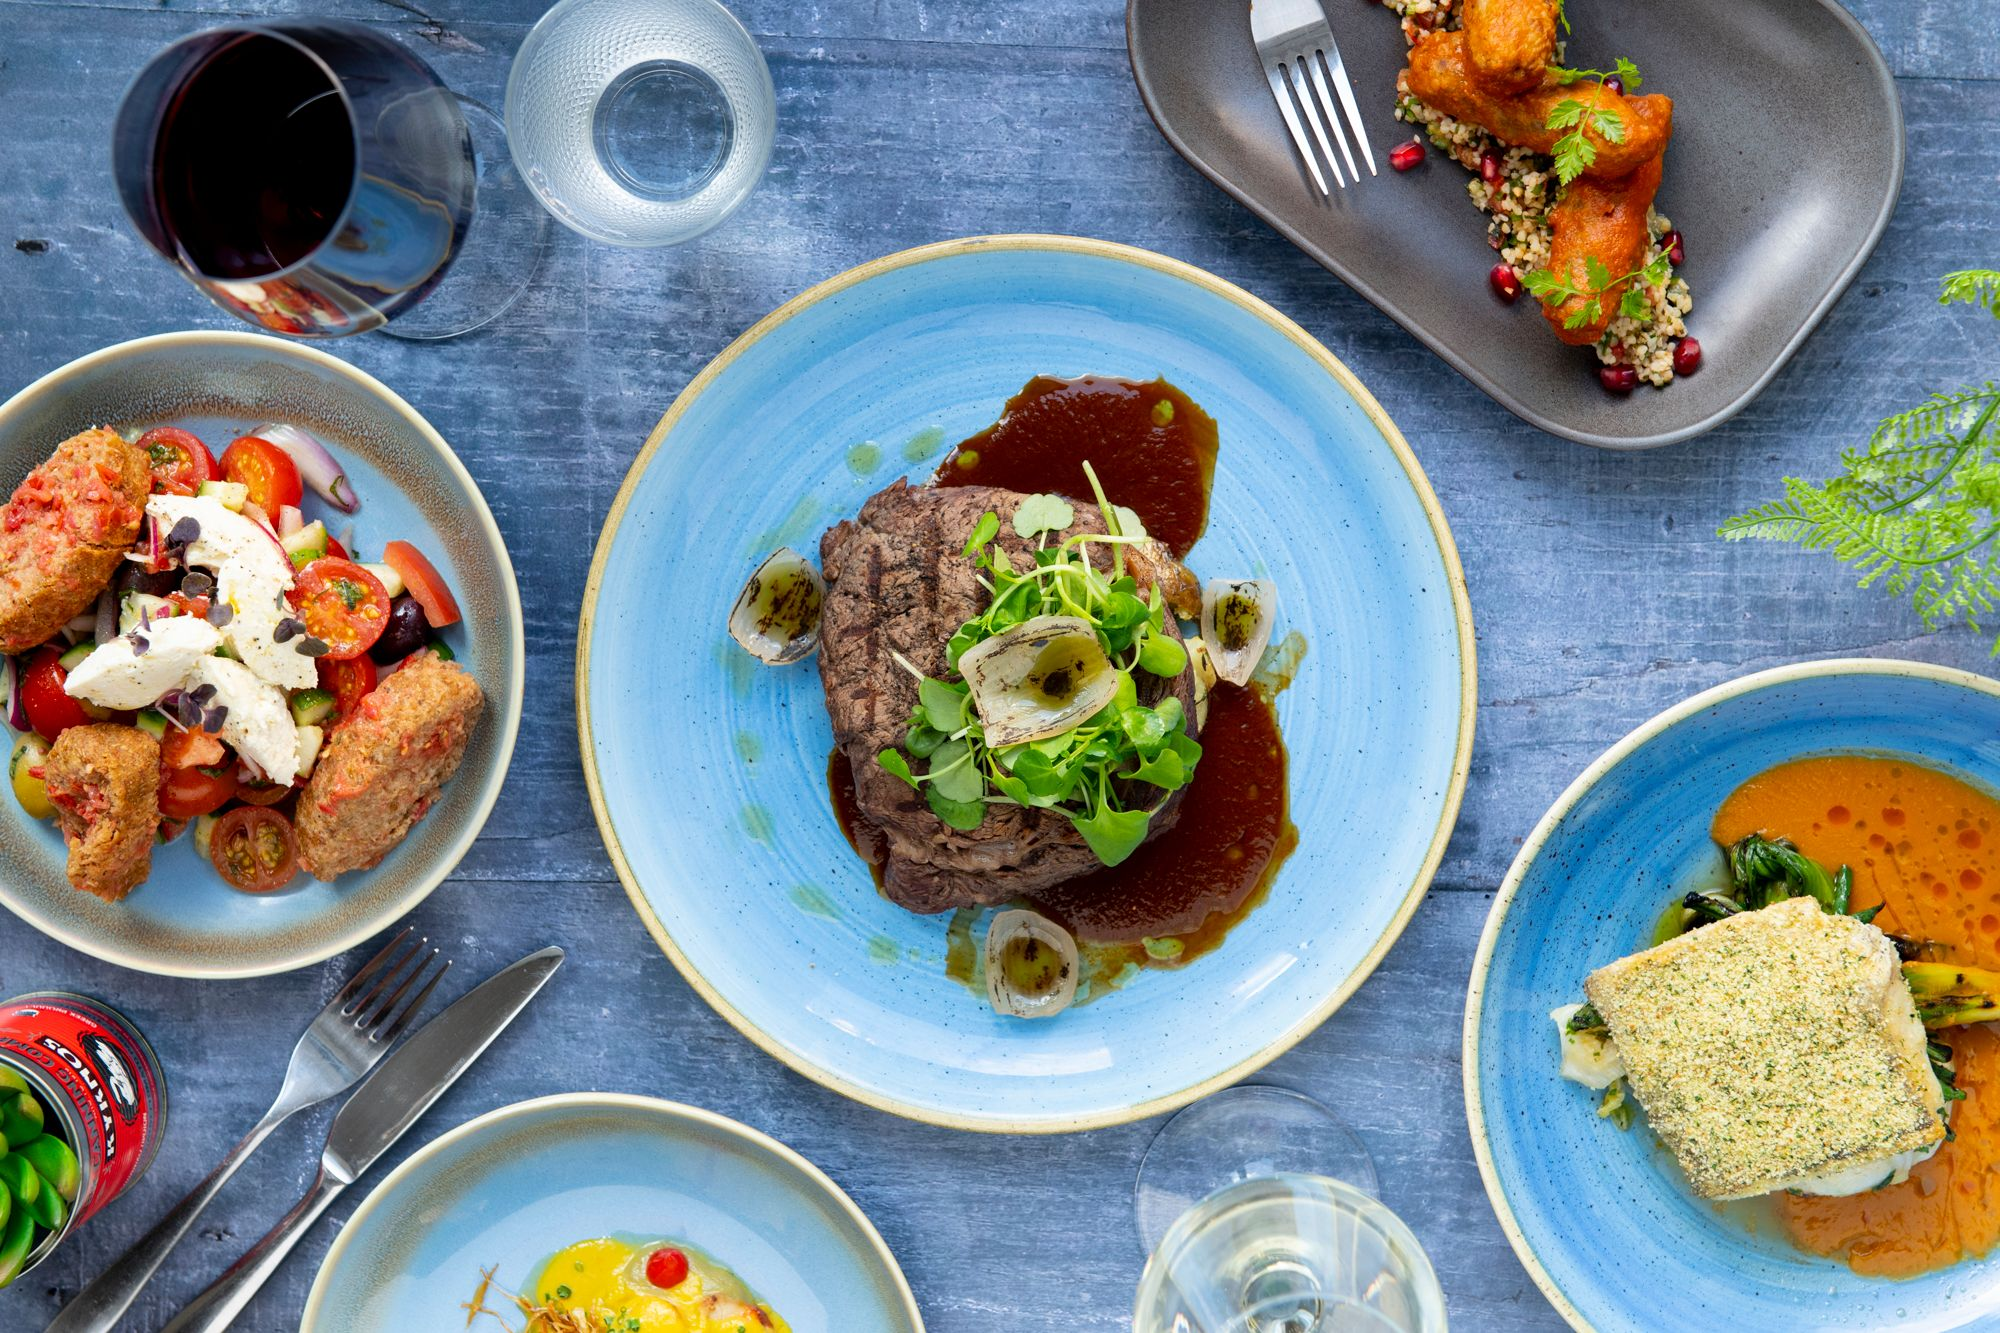 greek food on the table